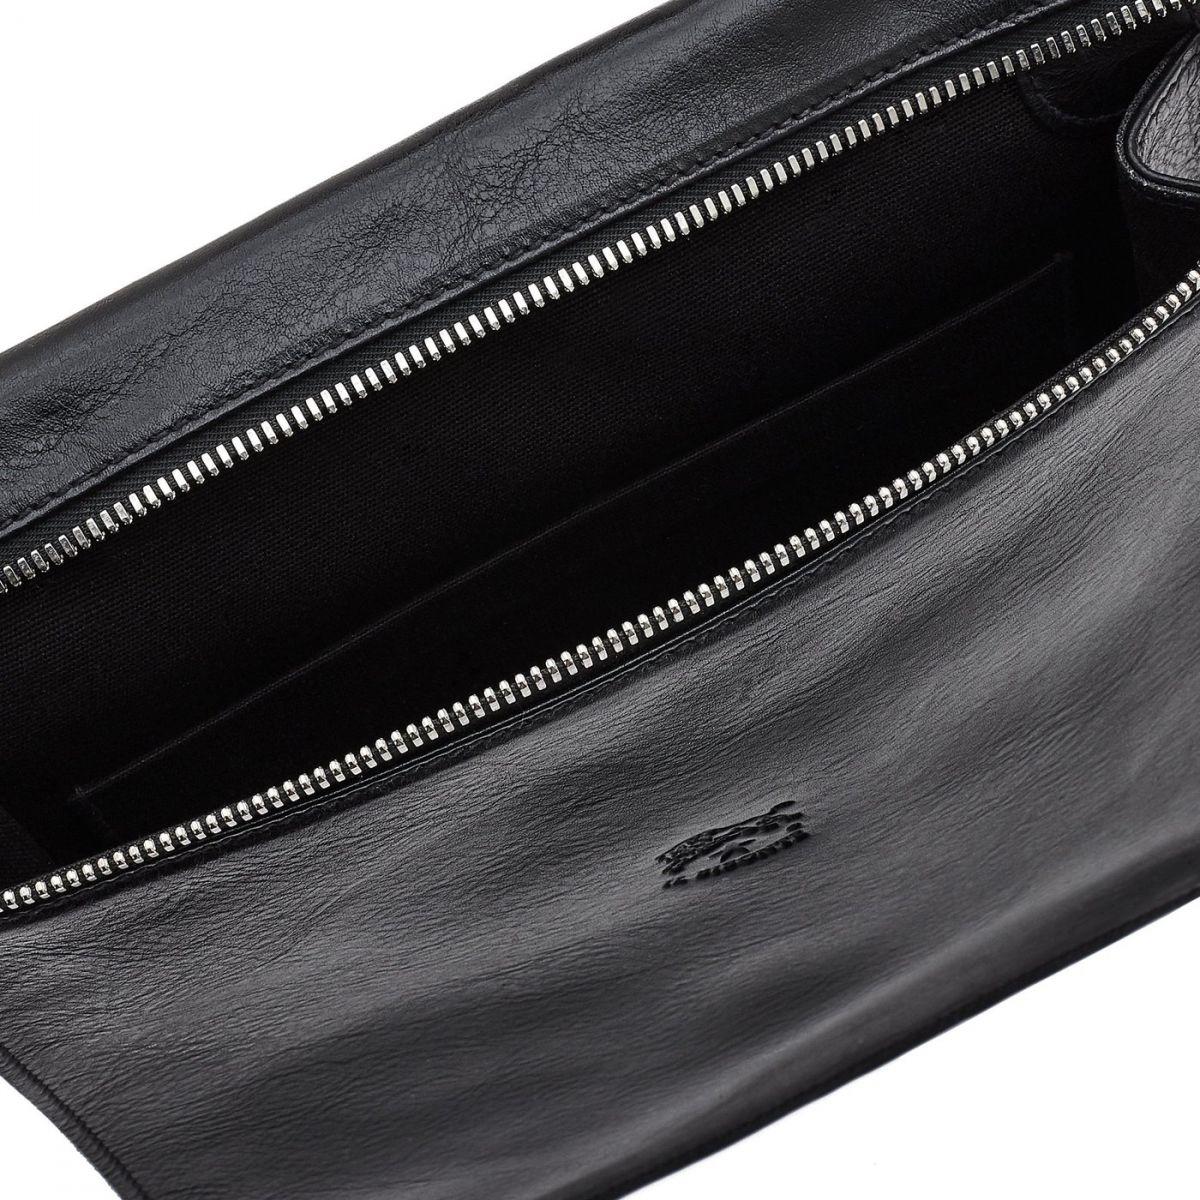 Men's Crossbody Bag in Cowhide Double Leather BCR067 color Black | Details